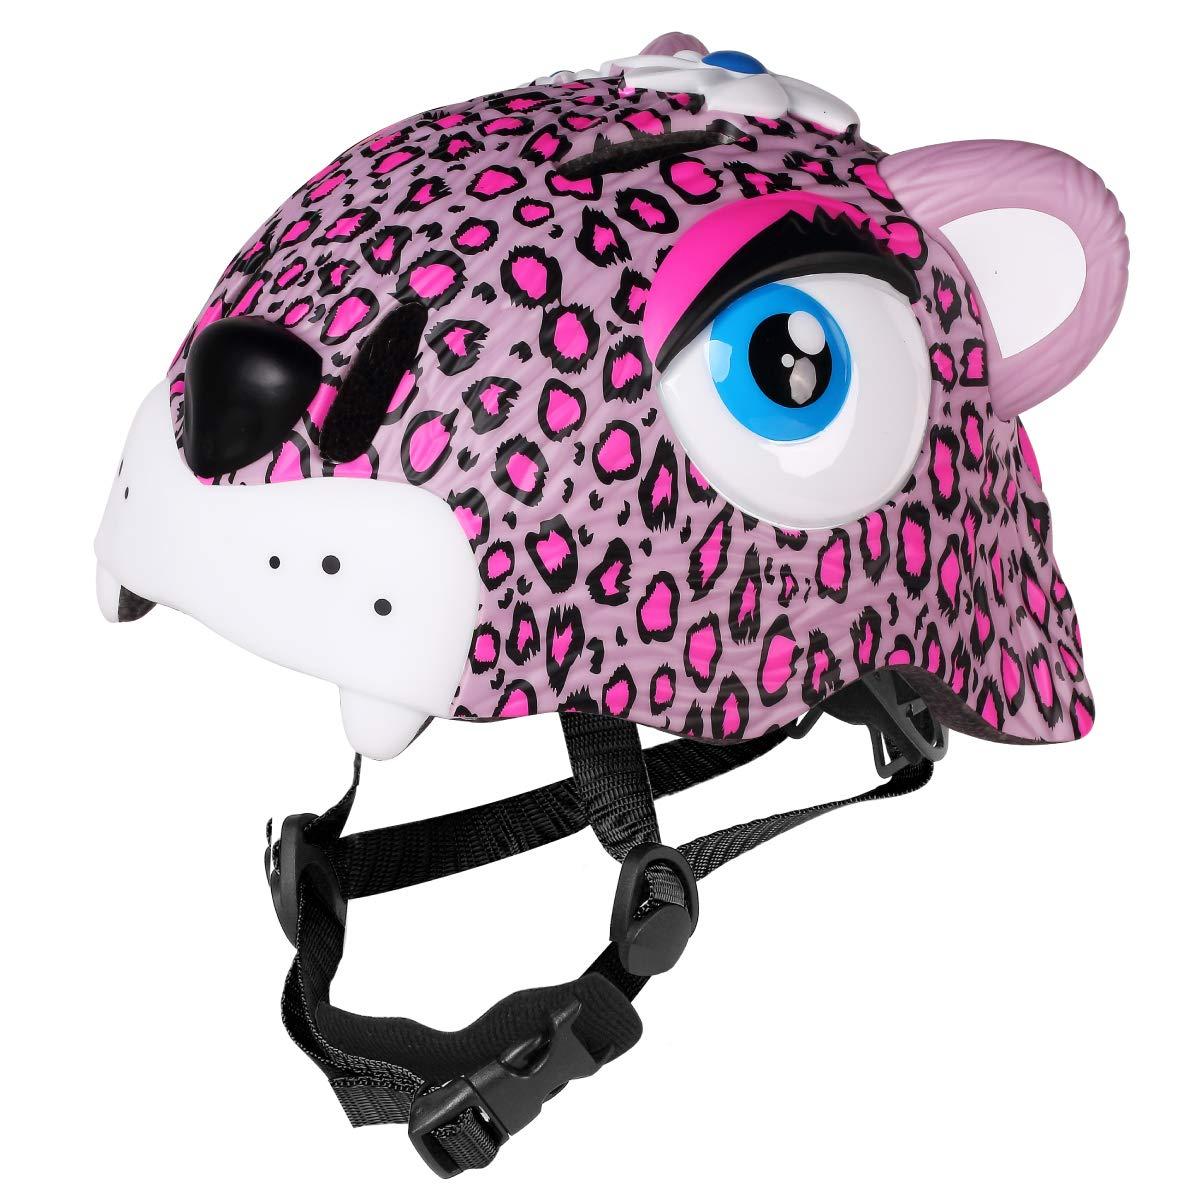 M Merkapa Kids Bike Helmet Adjustable 3D Shark Bicycle Helmets for Toddler and Youth (Panther)